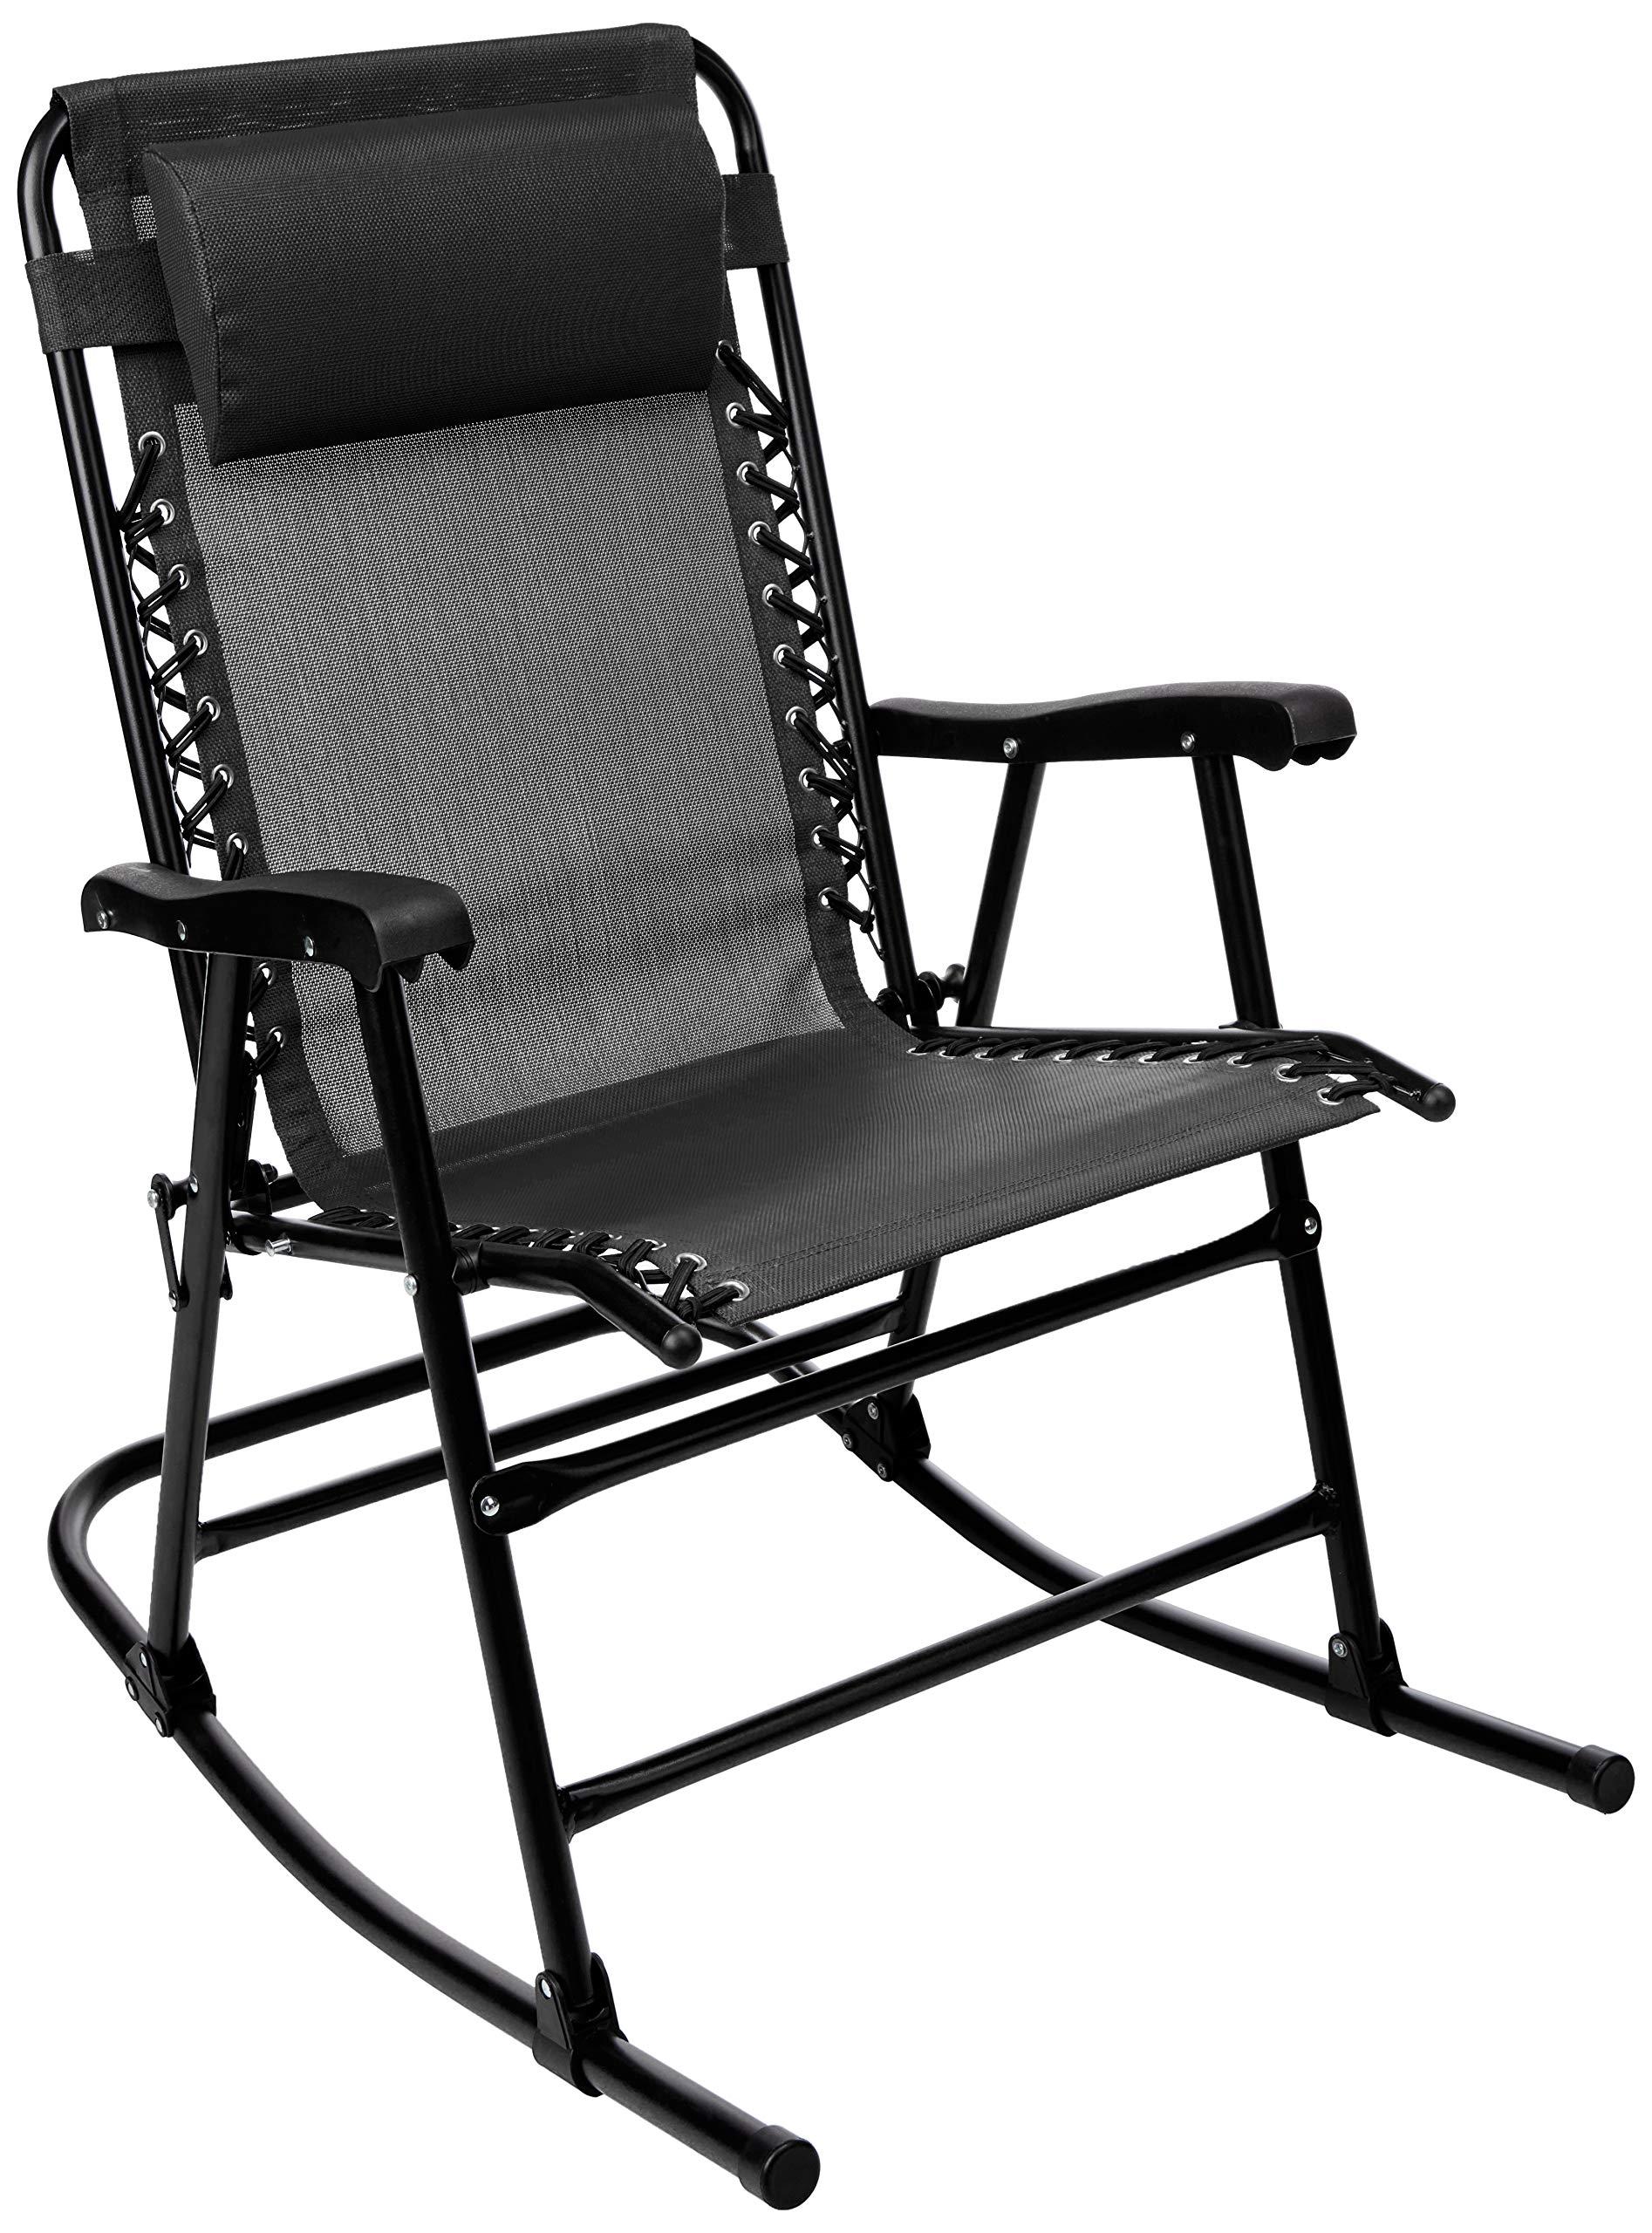 AmazonBasics Foldable Rocking Chair - Black